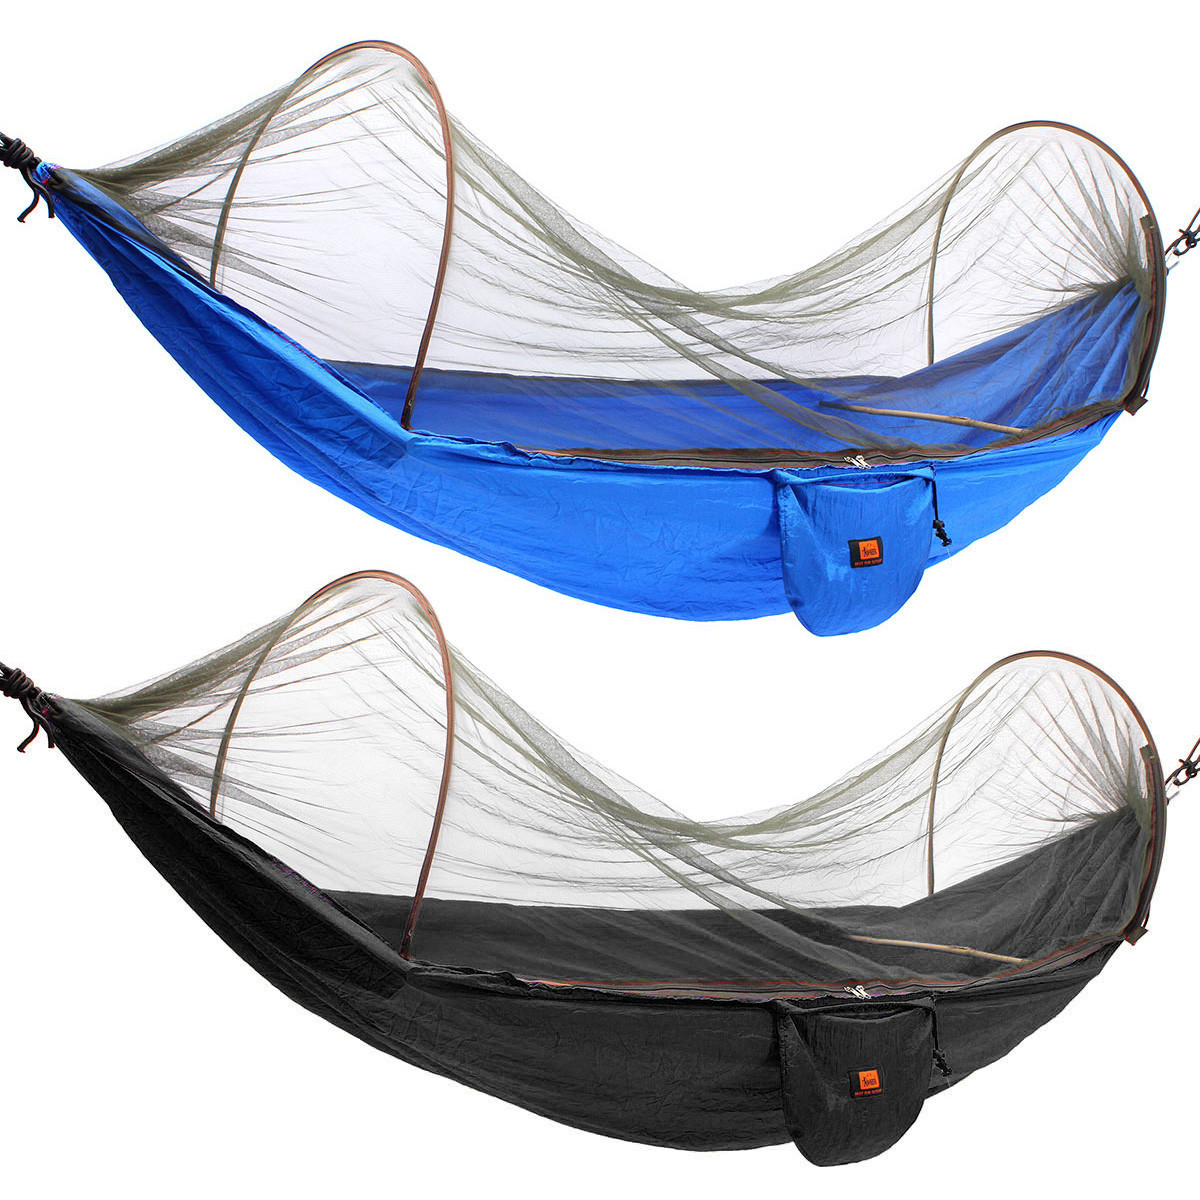 Outdoor Portable Camping Parachute Hammock Hanging Swing